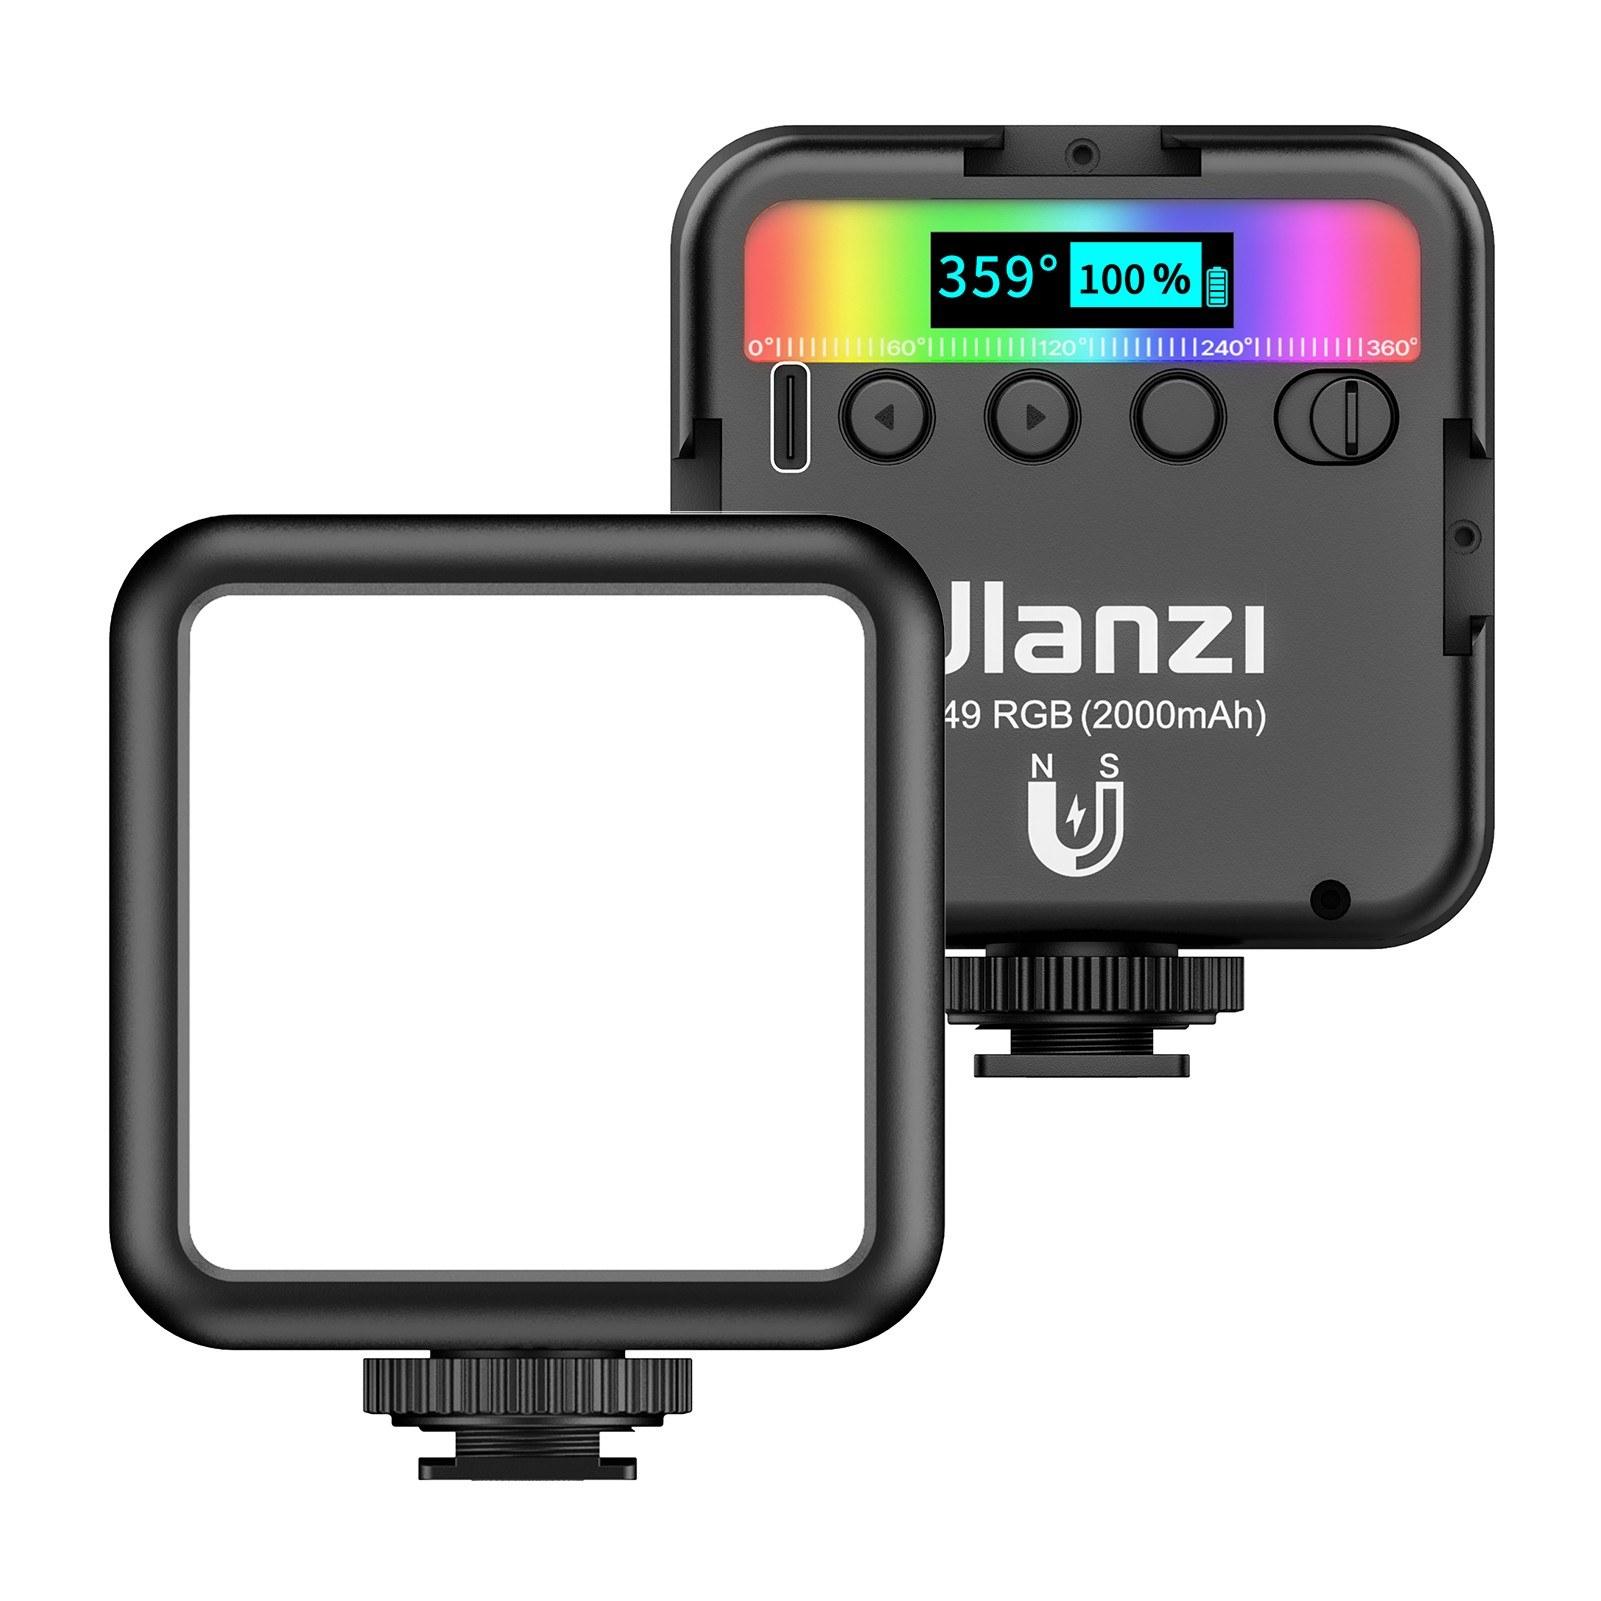 cafago.com - 61% OFF ulanzi VL49 RGB Pocket LED Video Light Photography Fill Light,free shipping+$18.16